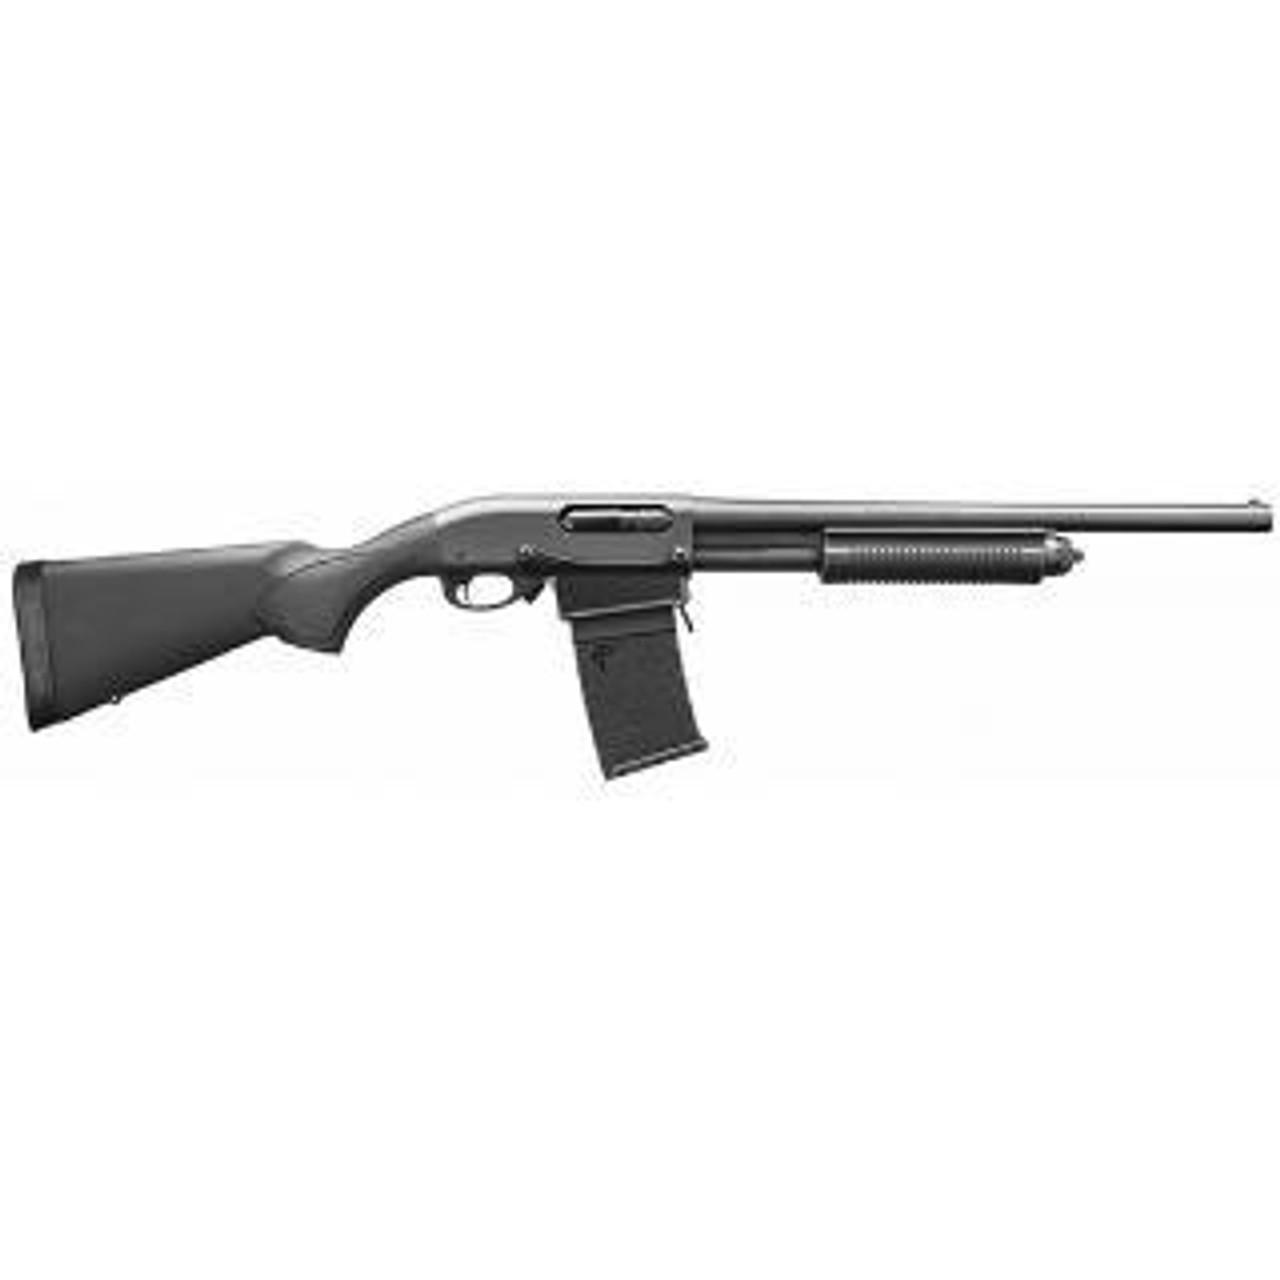 Remington 870 DM CALIFORNIA LEGAL - 12GA